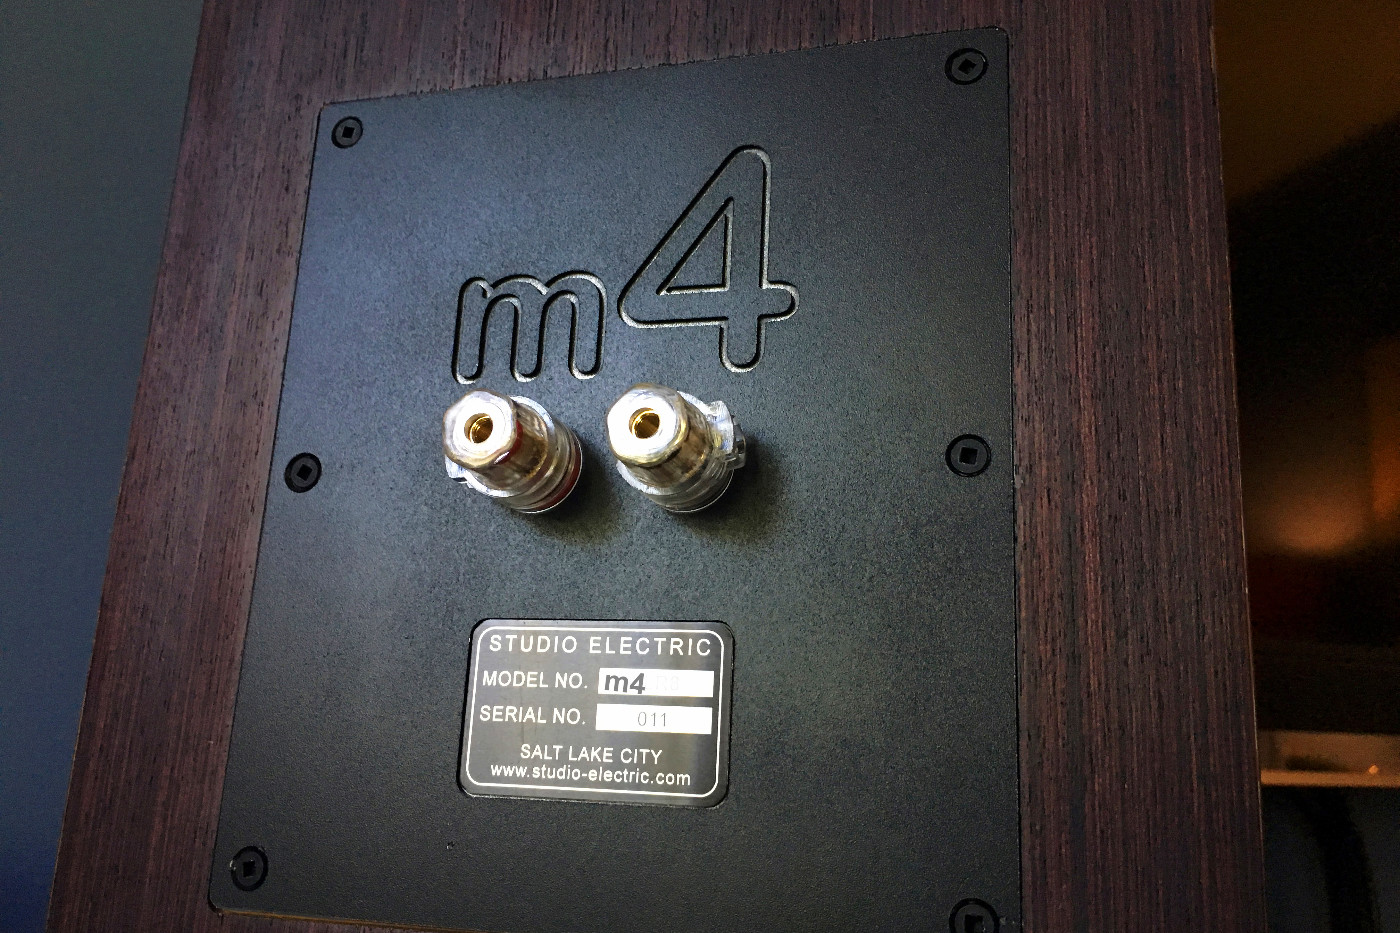 M4 jackplate